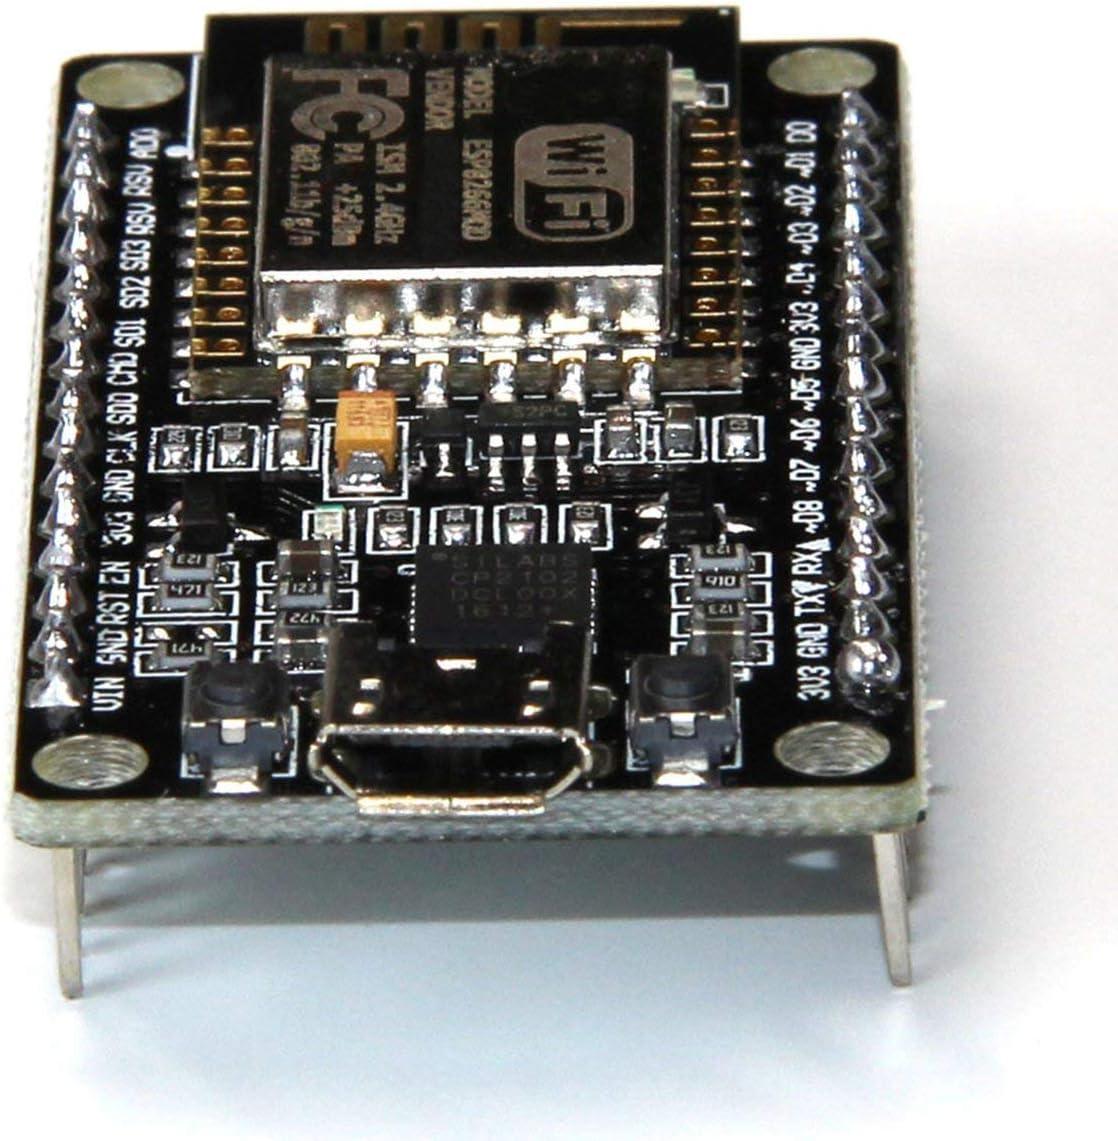 JIUY High Precision Durable Use NodeMcu Lua WIFI Internet Things development board based ESP8266 CP2102 module Board black